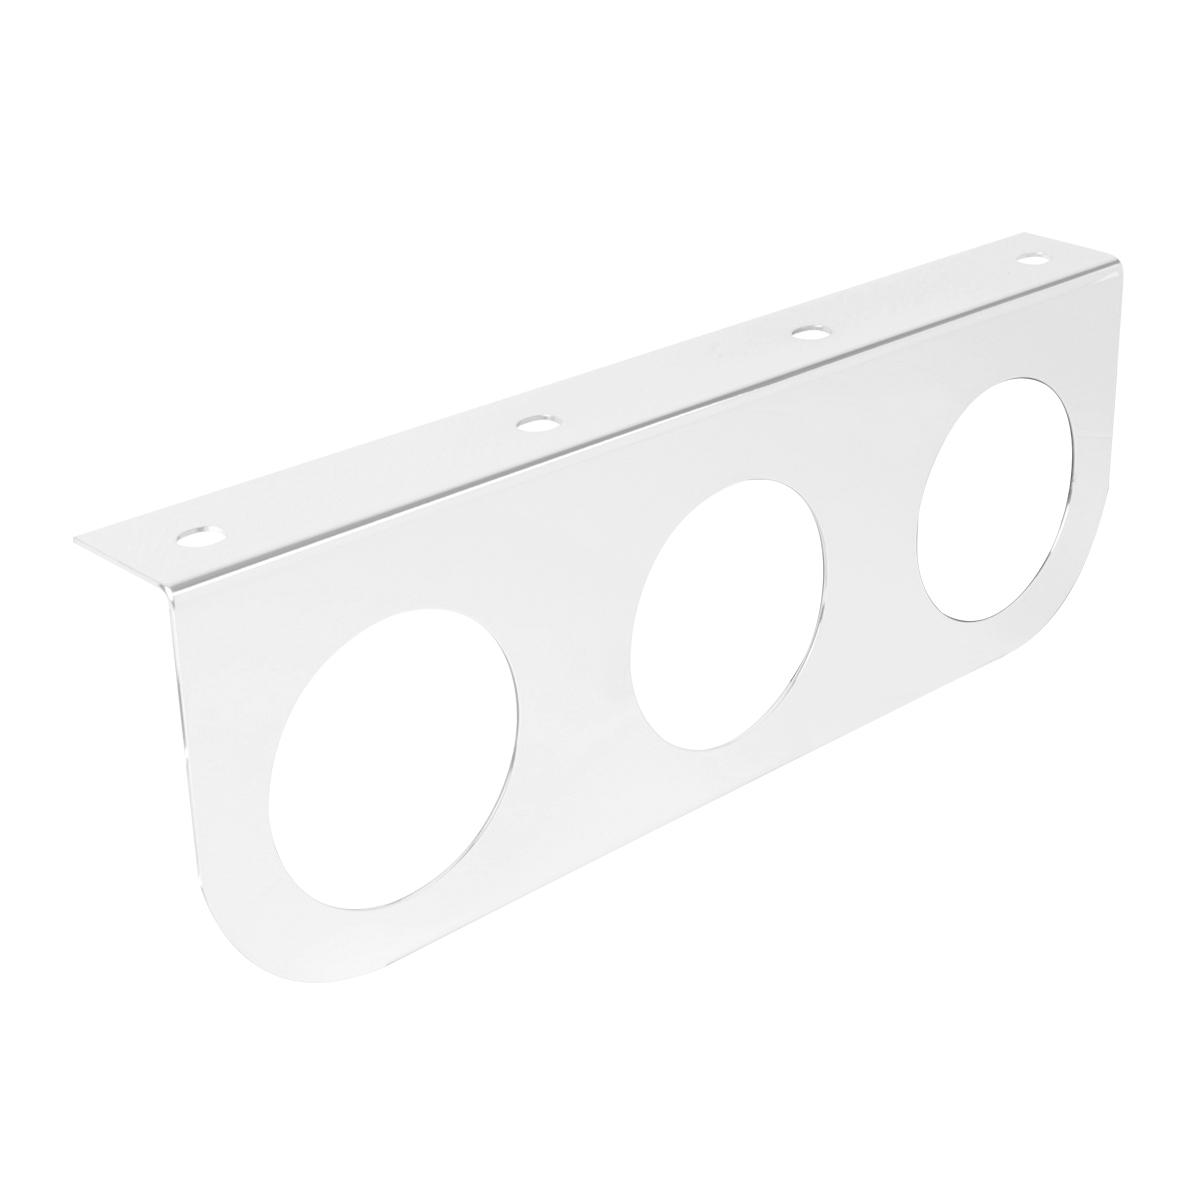 #81520 Chrome Plated Steel Light Bracket Only